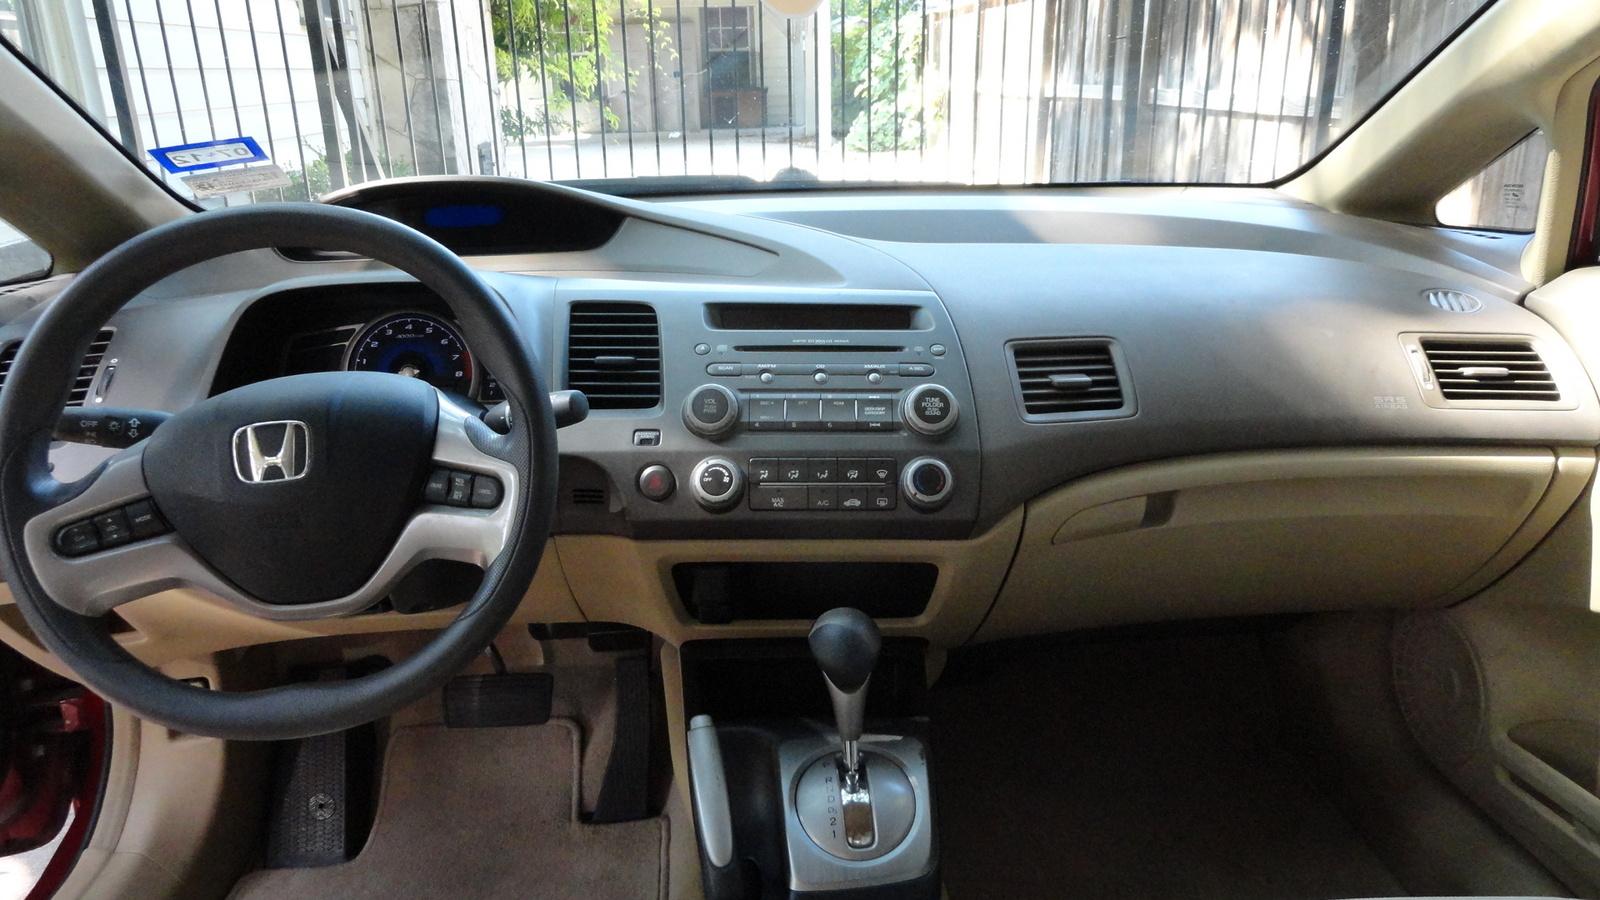 Honda Civic Ex 2006 Interior 2016 Honda Civic Ex 2006 Interior